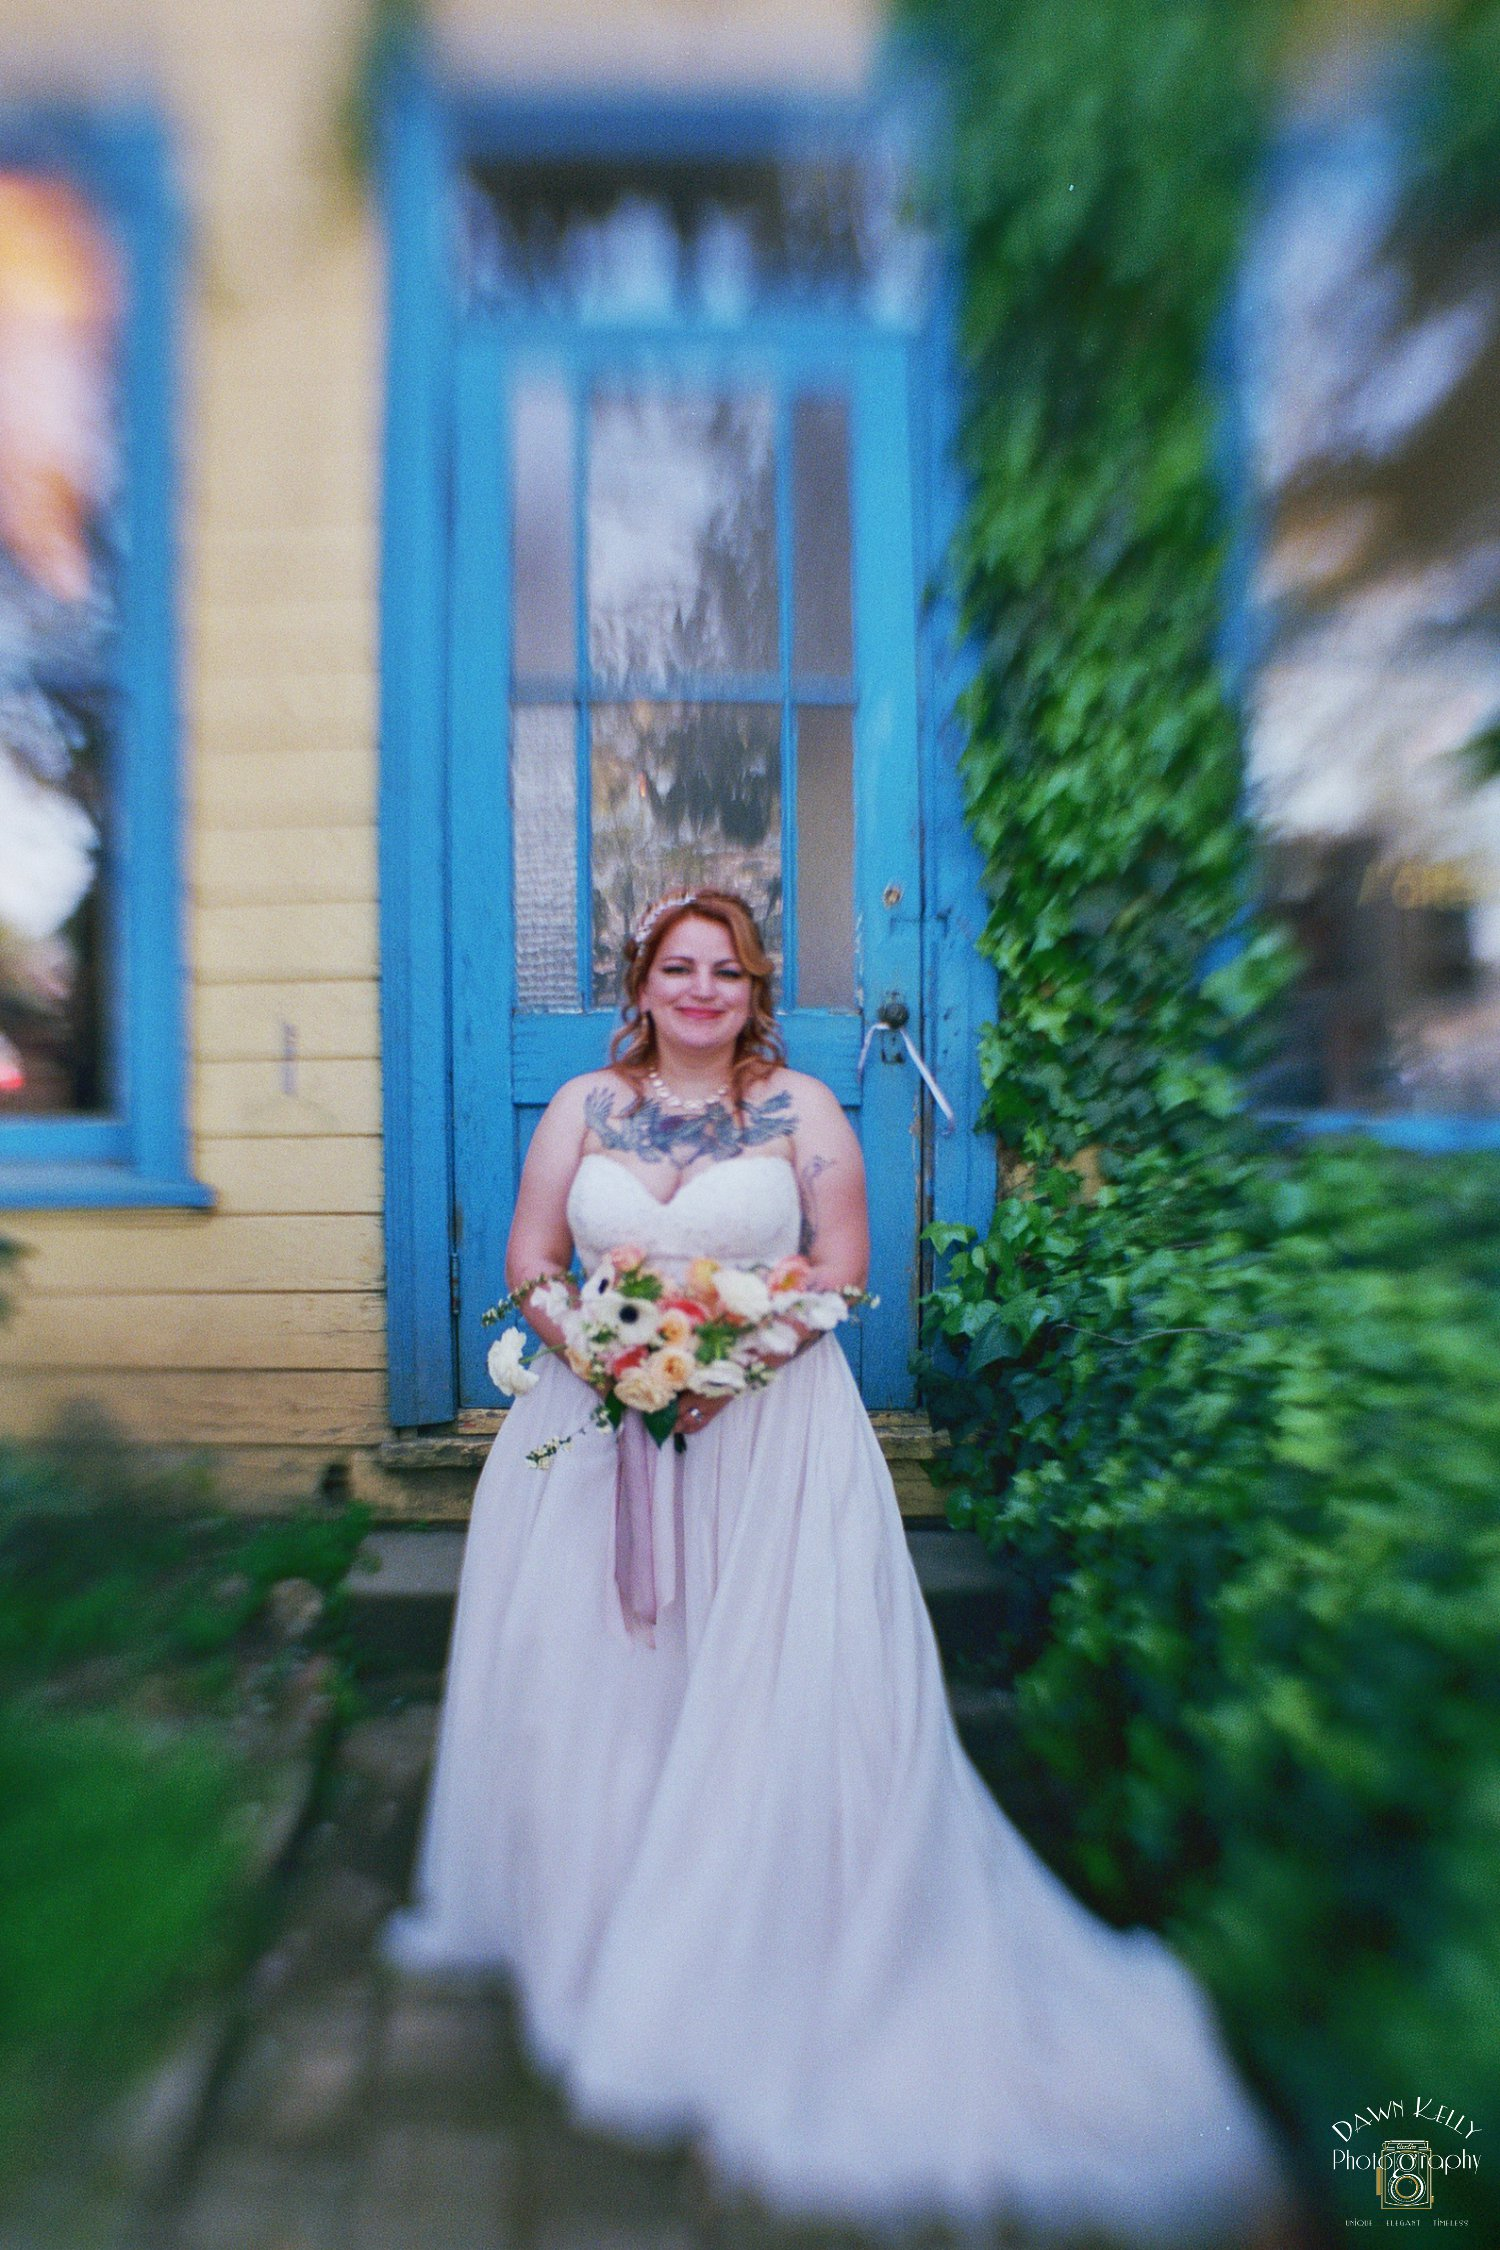 Tilt shift photo of bride